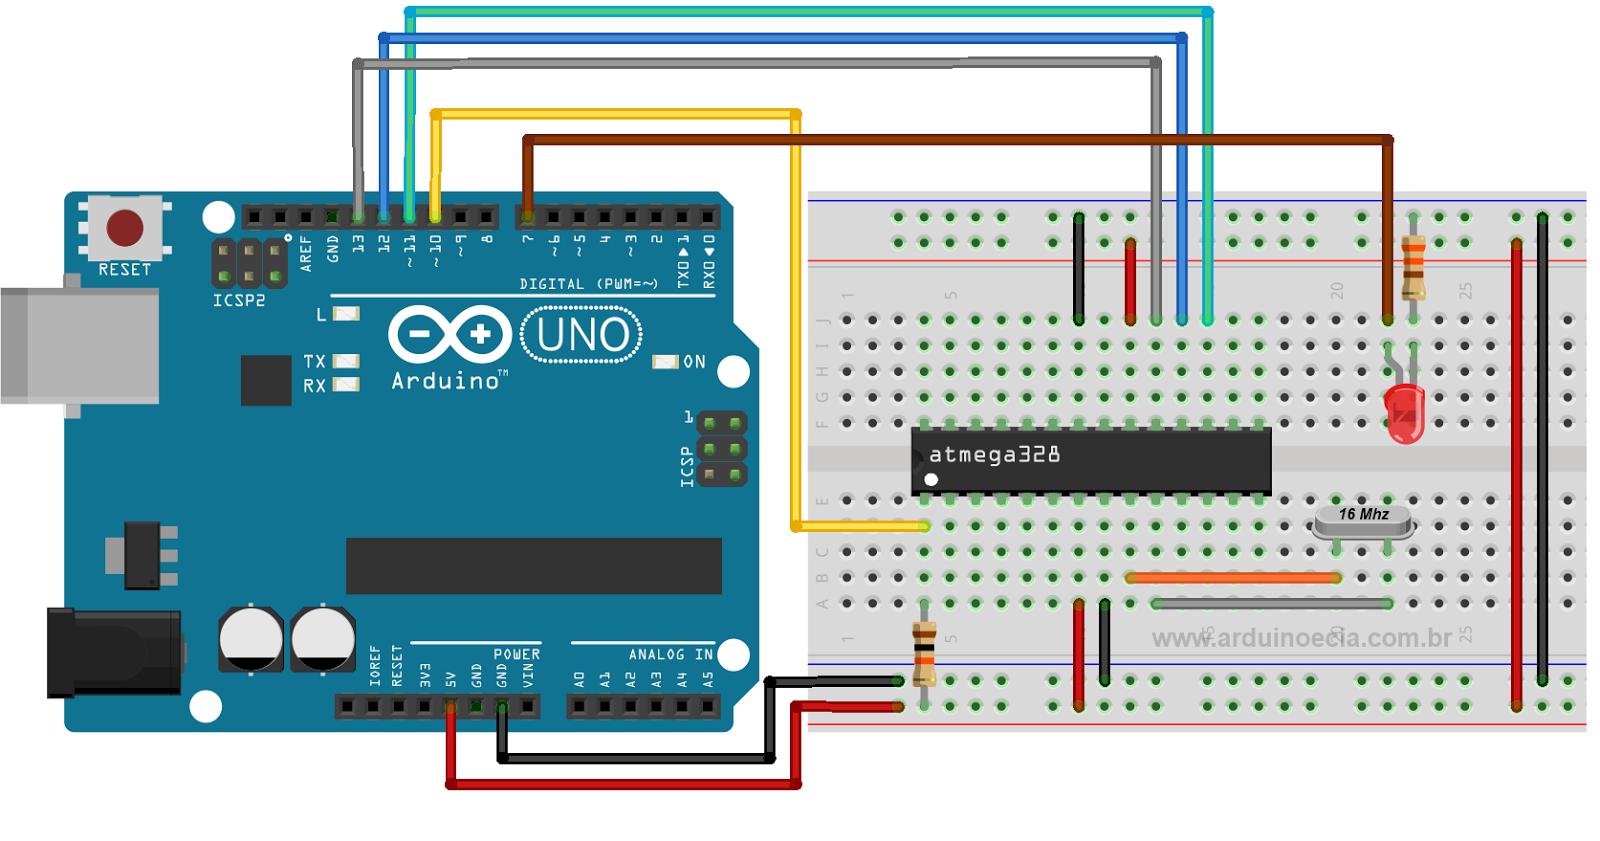 Gravando bootloader no atmega usando arduino